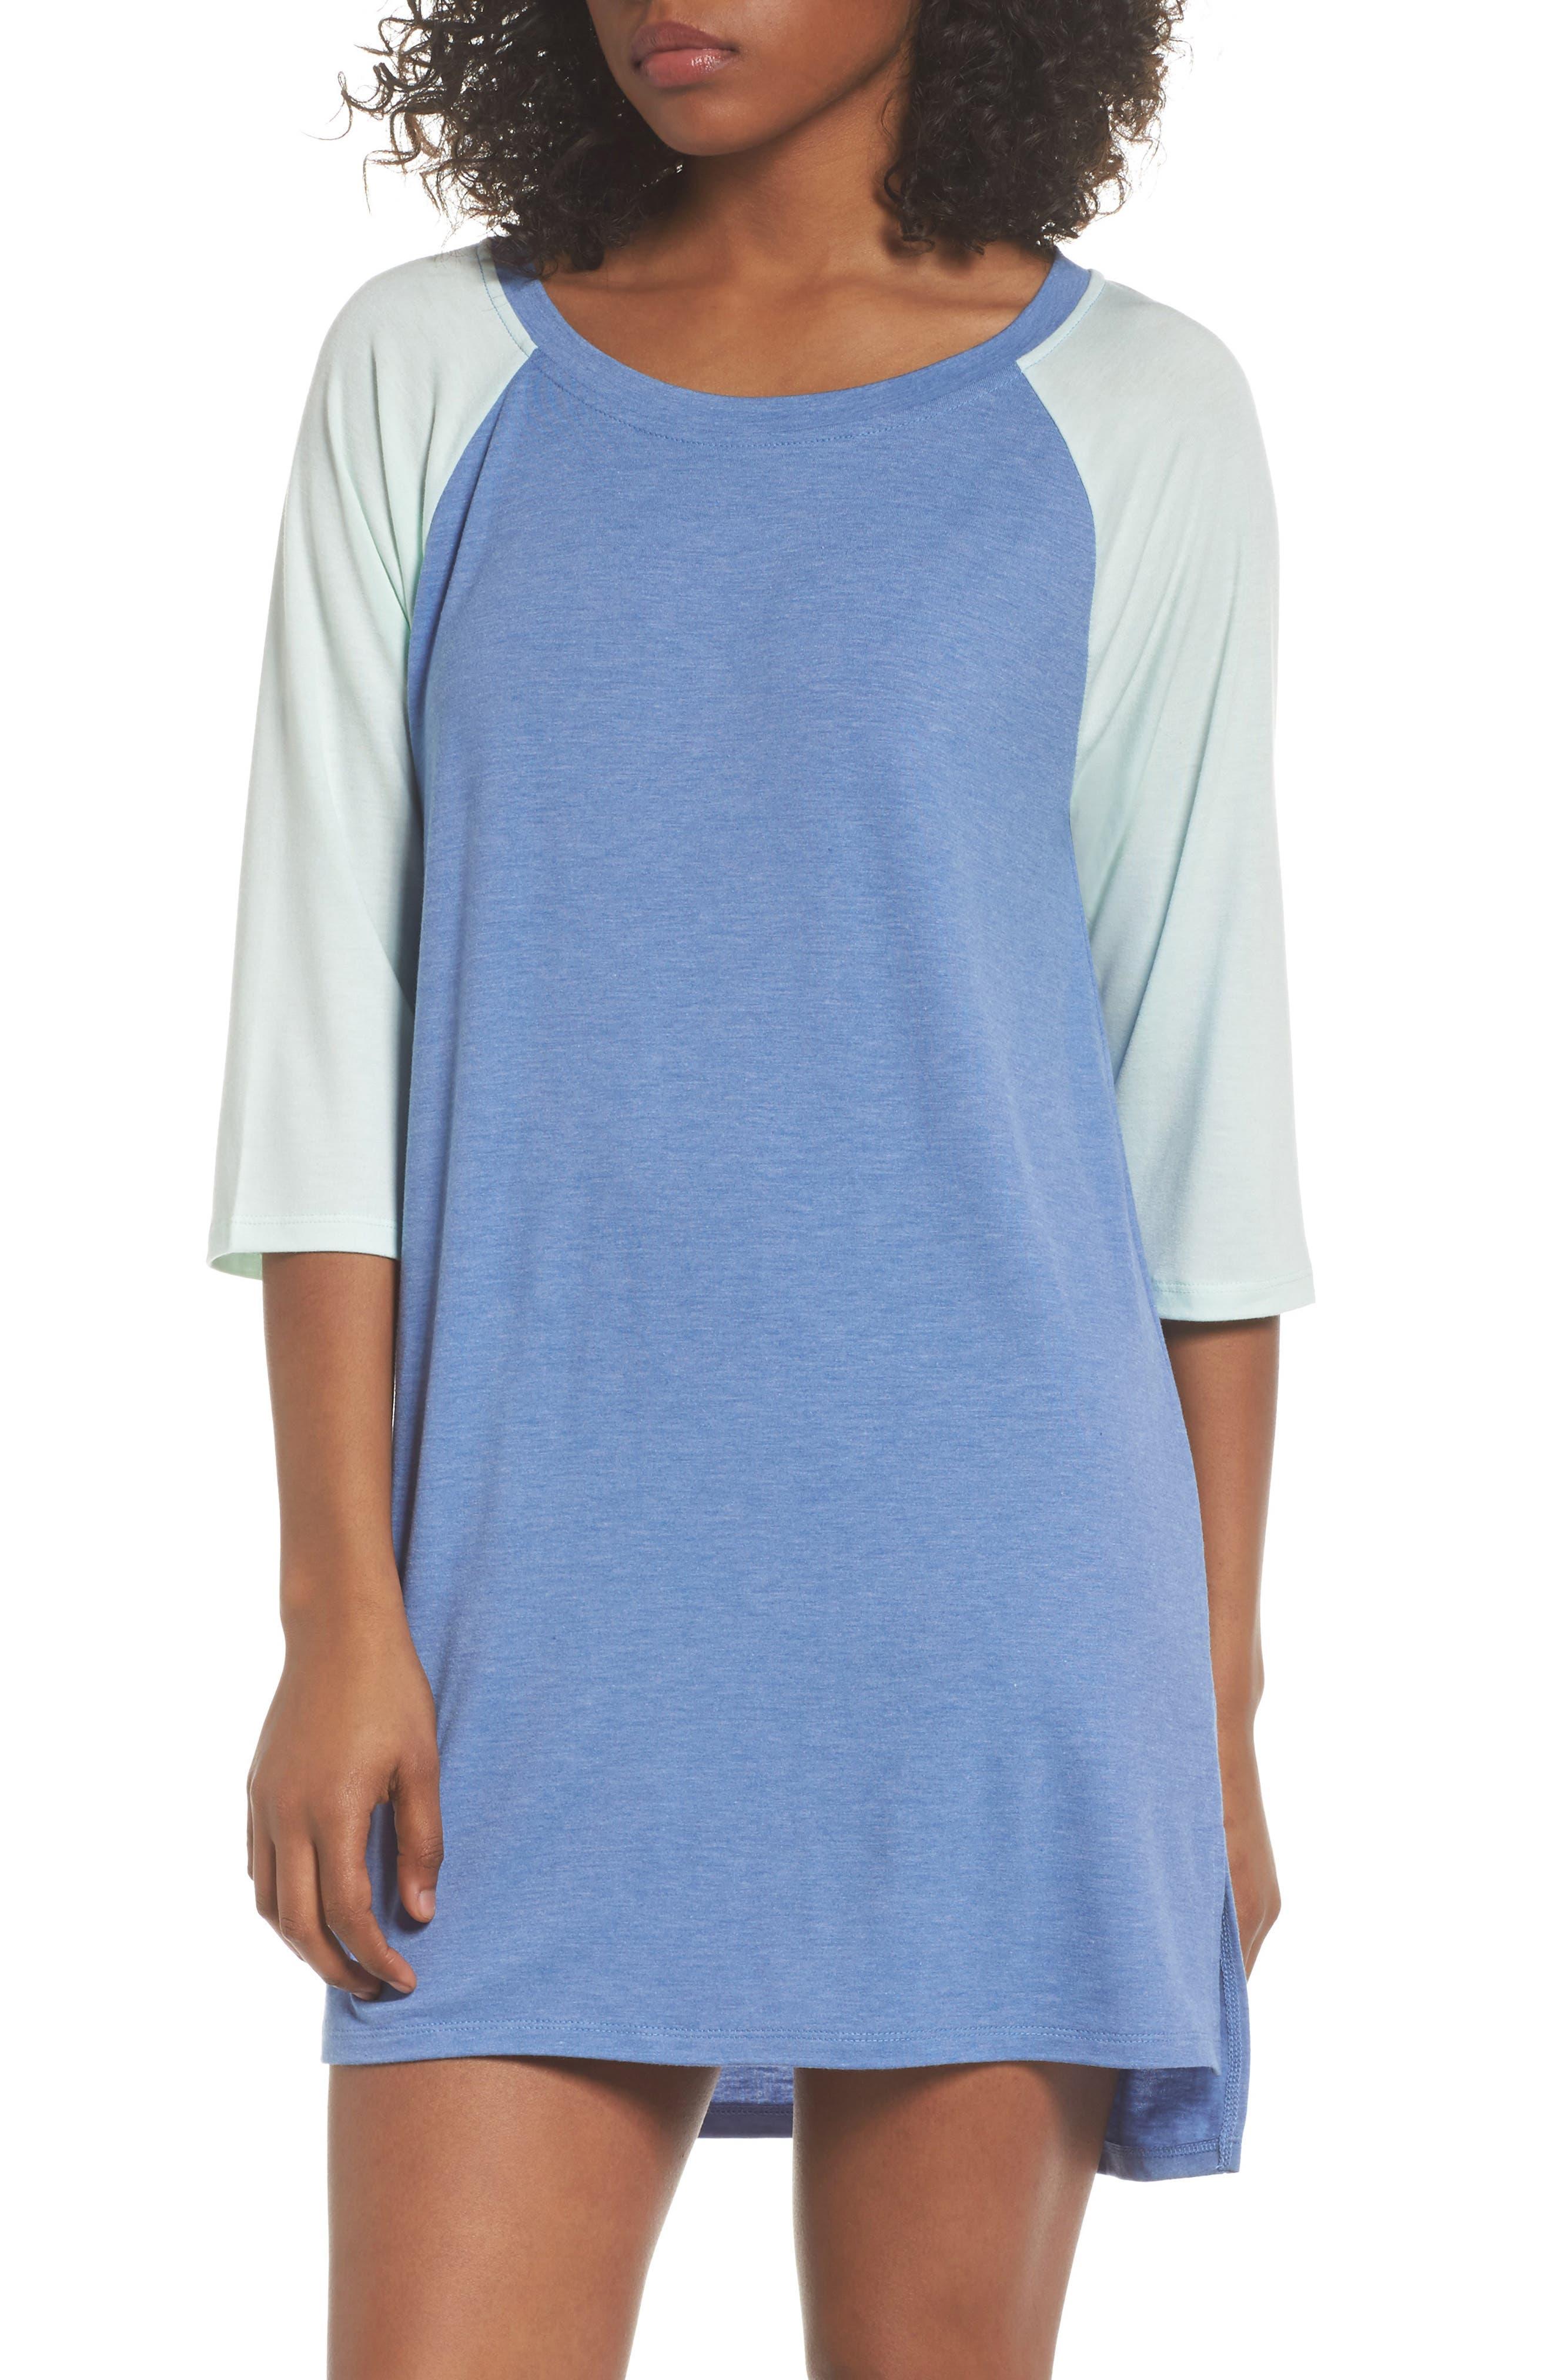 Honeydew All American Sleep Shirt,                             Main thumbnail 3, color,